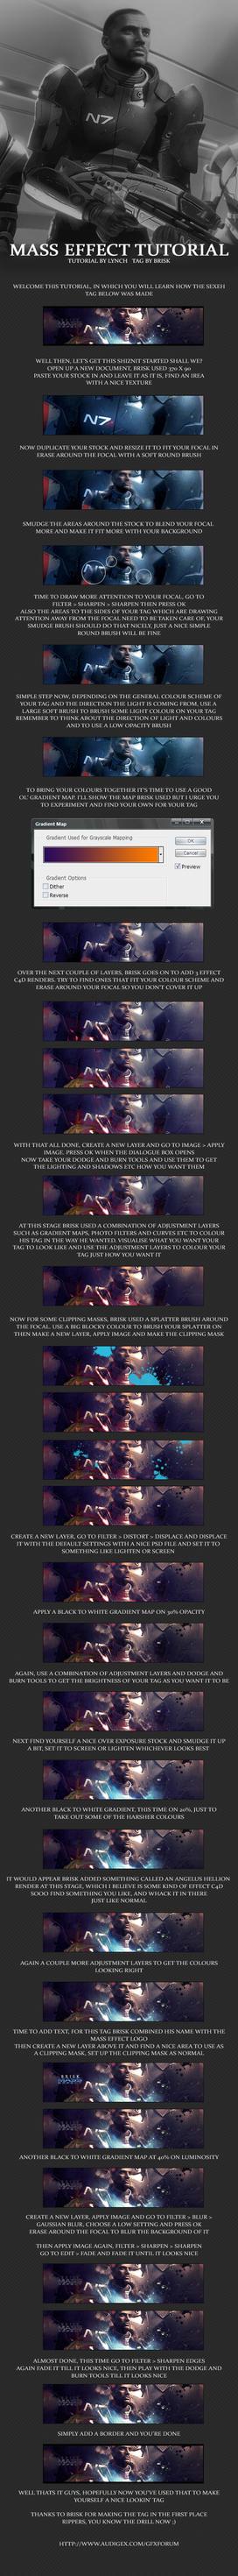 Mass Effect by brisktutorials